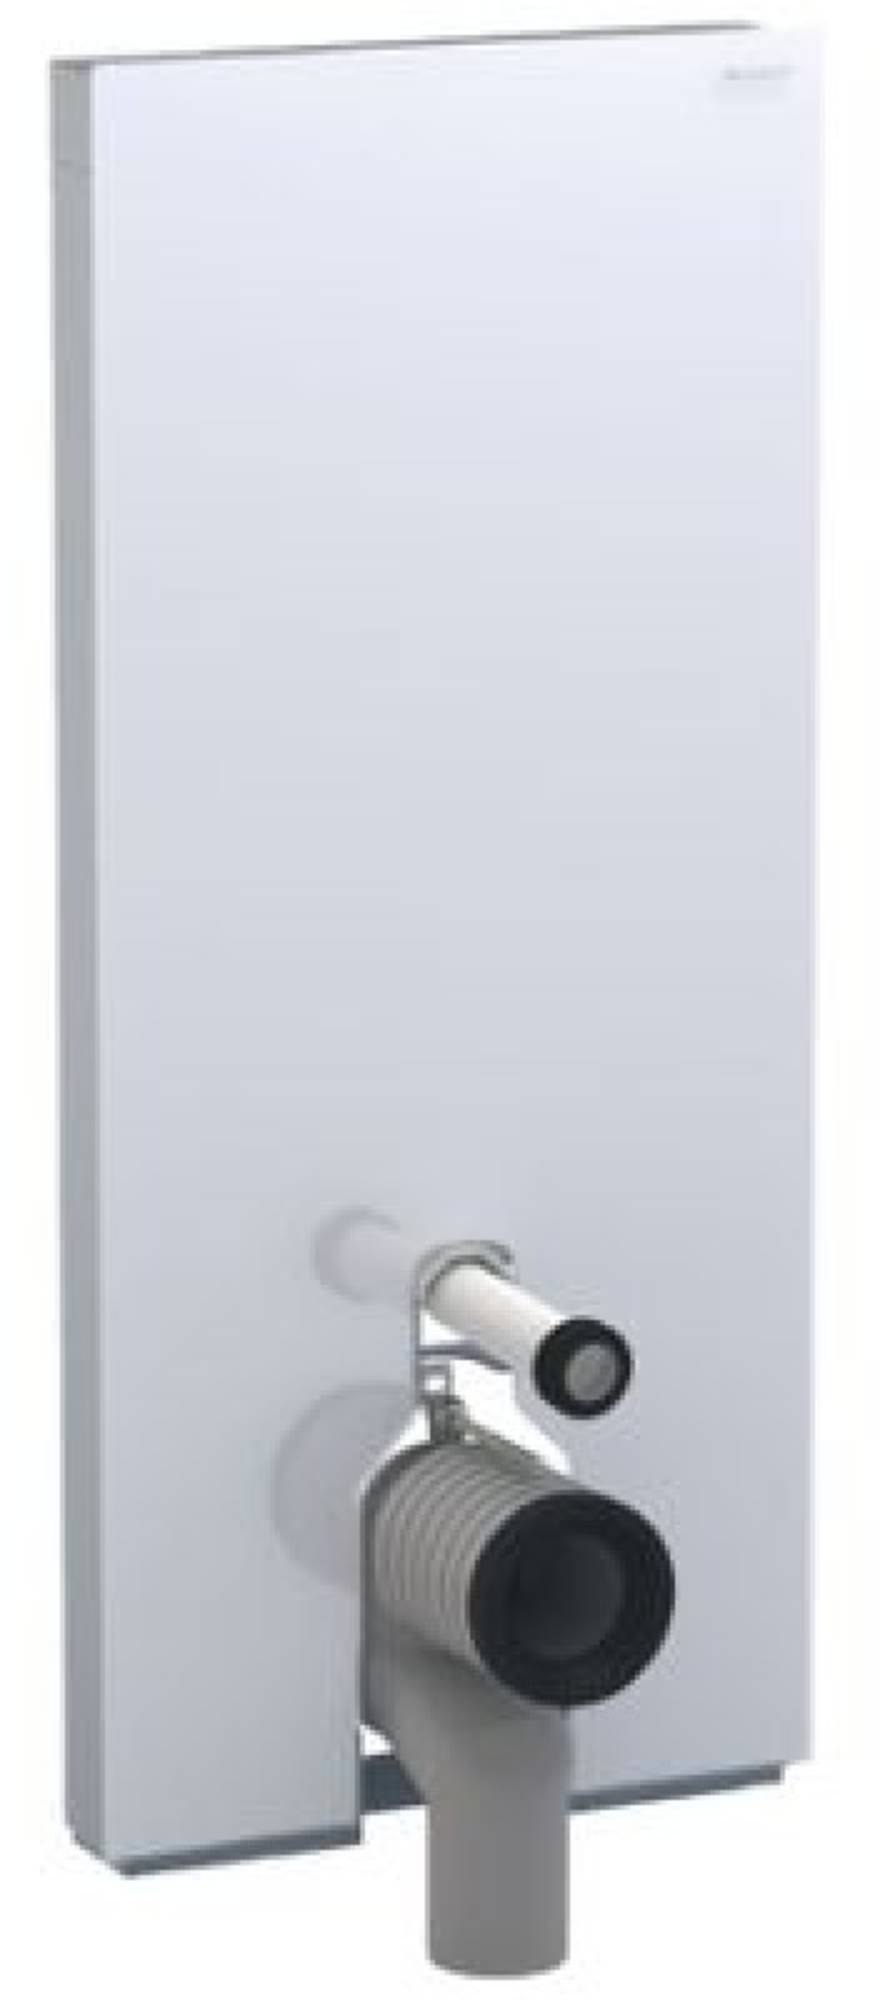 Geberit Monolith plus module voor staand closet h114 glas zwart aluminium